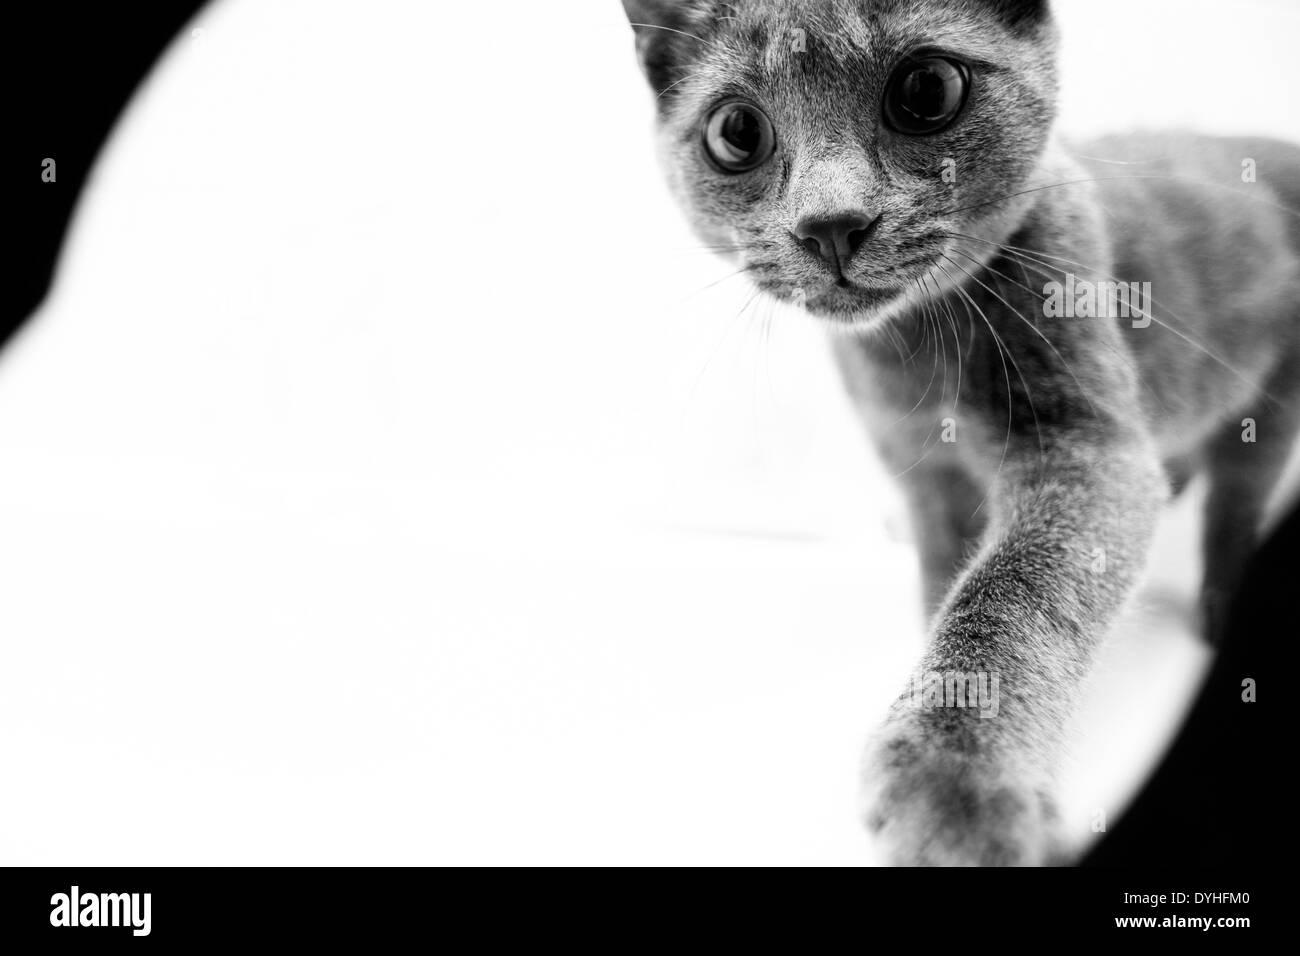 Un chat gris en fond blanc Photo Stock